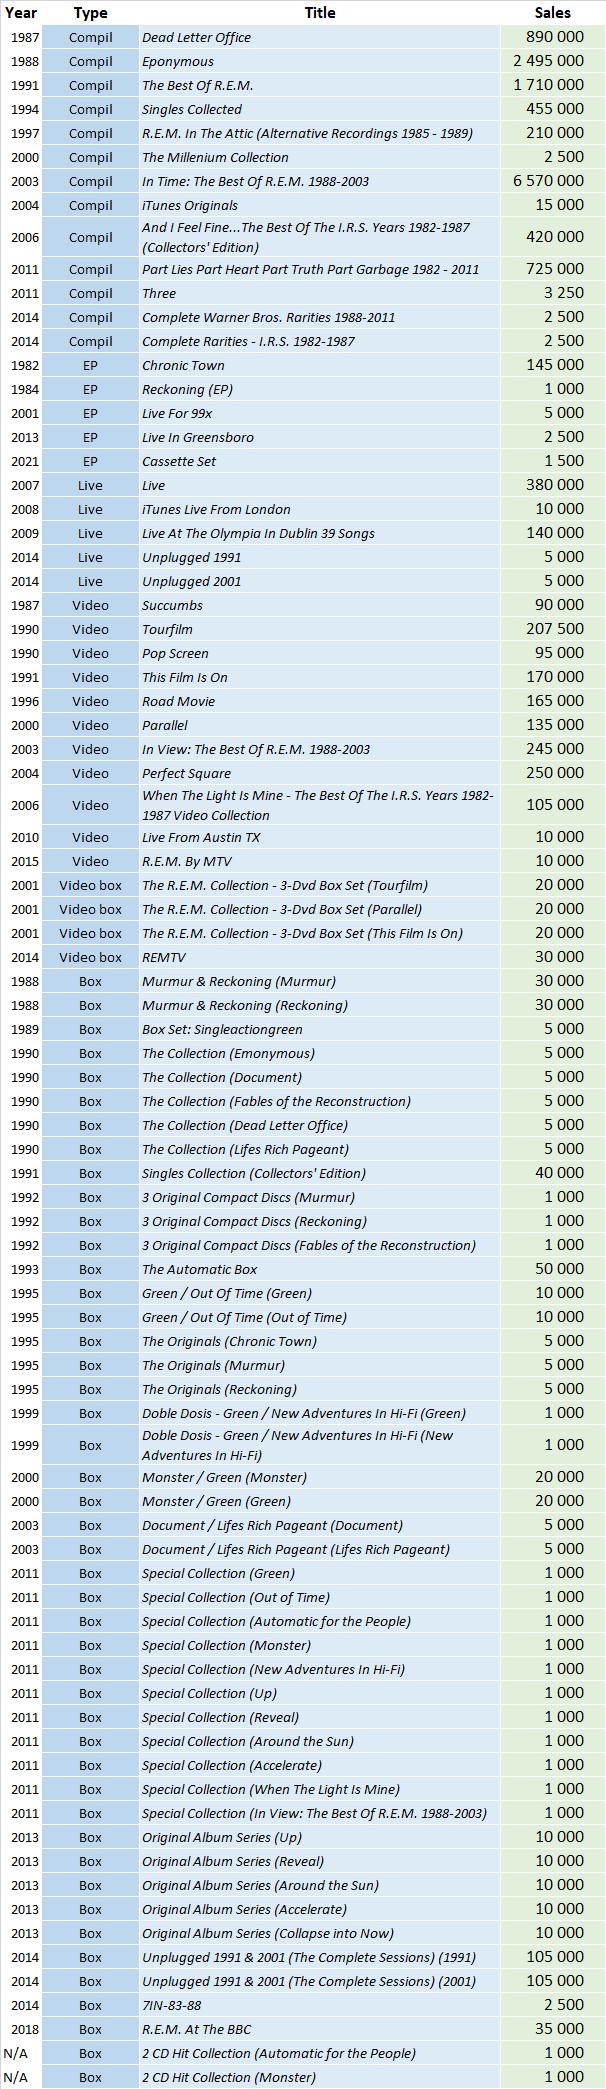 CSPC REM compilation sales distribution